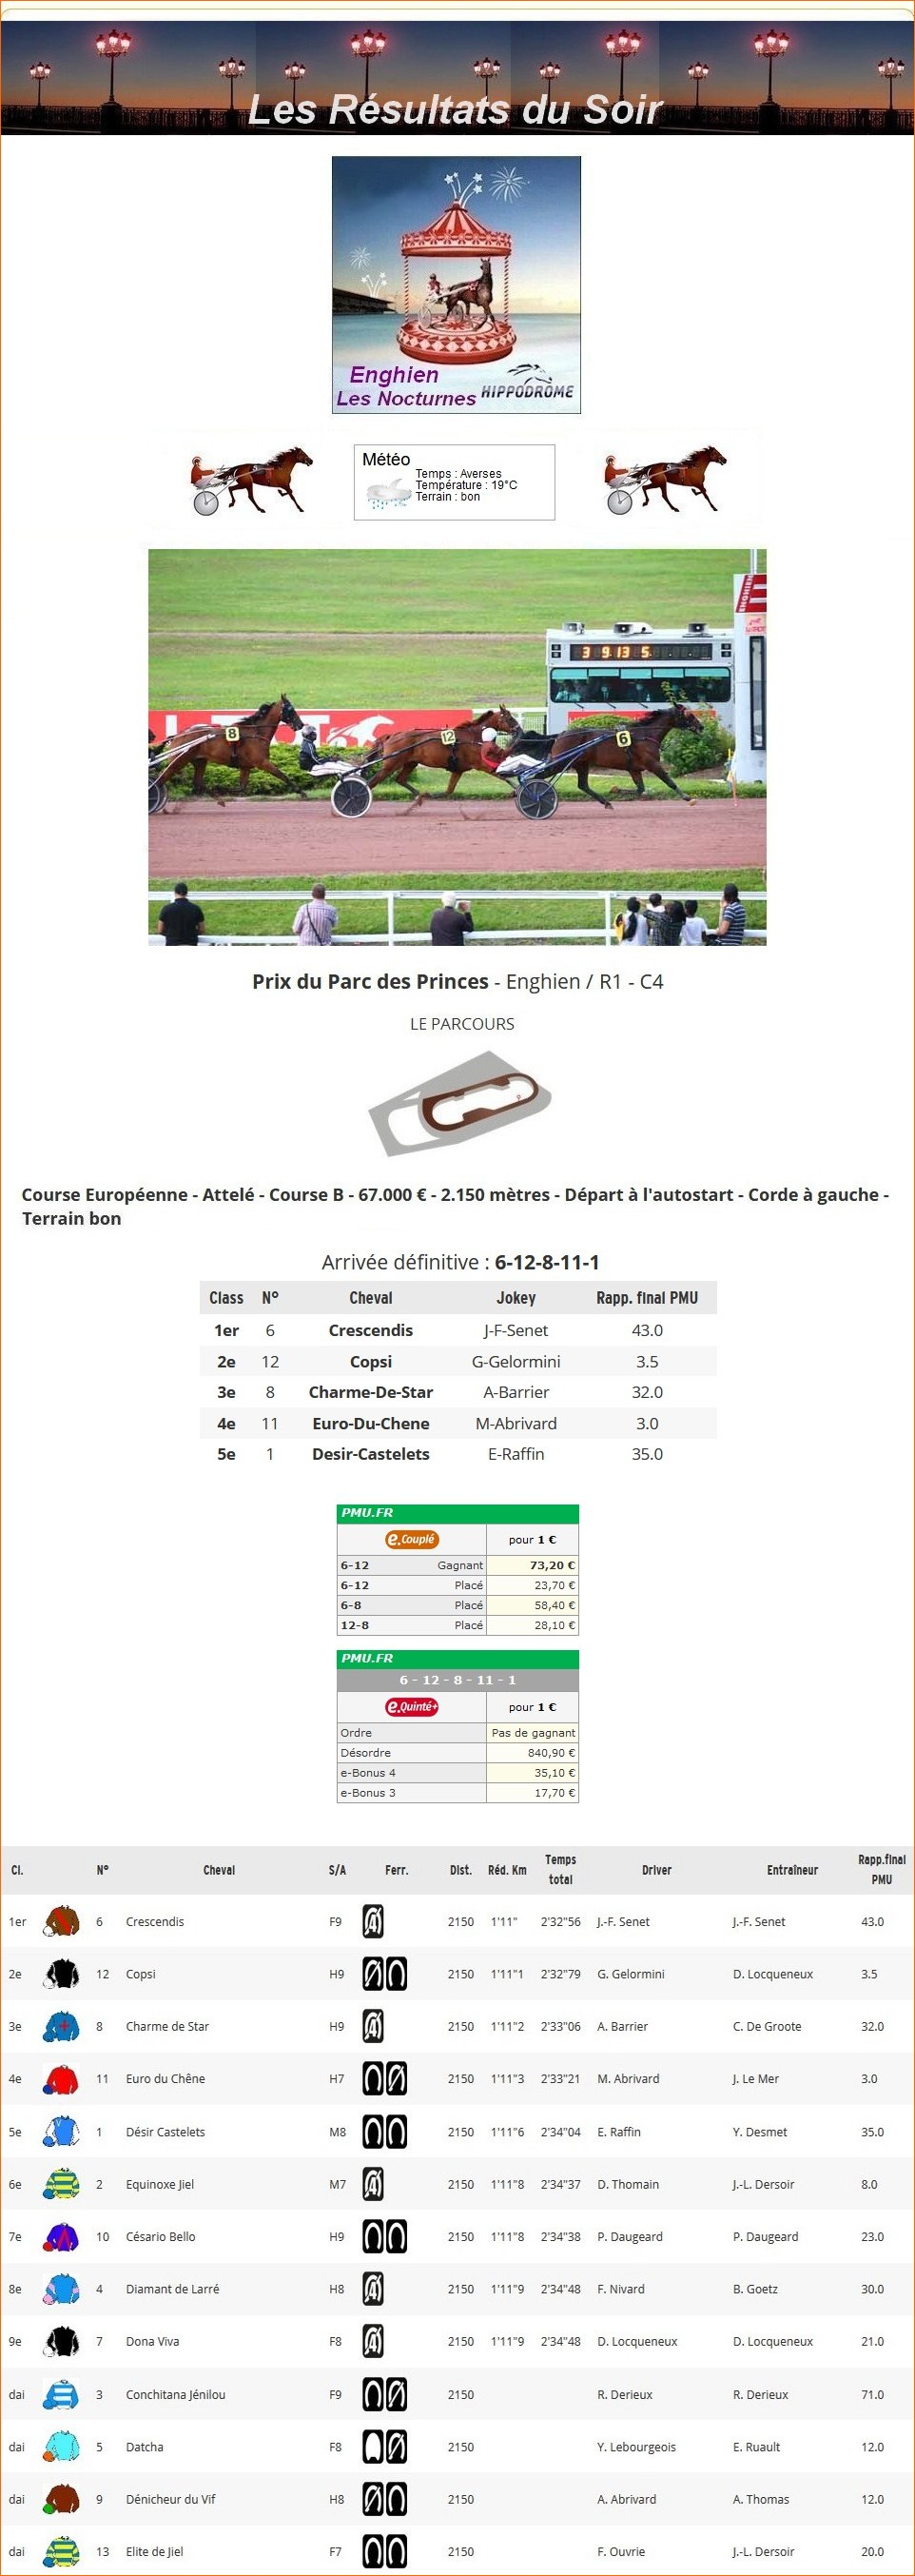 Résultats du Mercredi 04/08/2021 1_p-1155